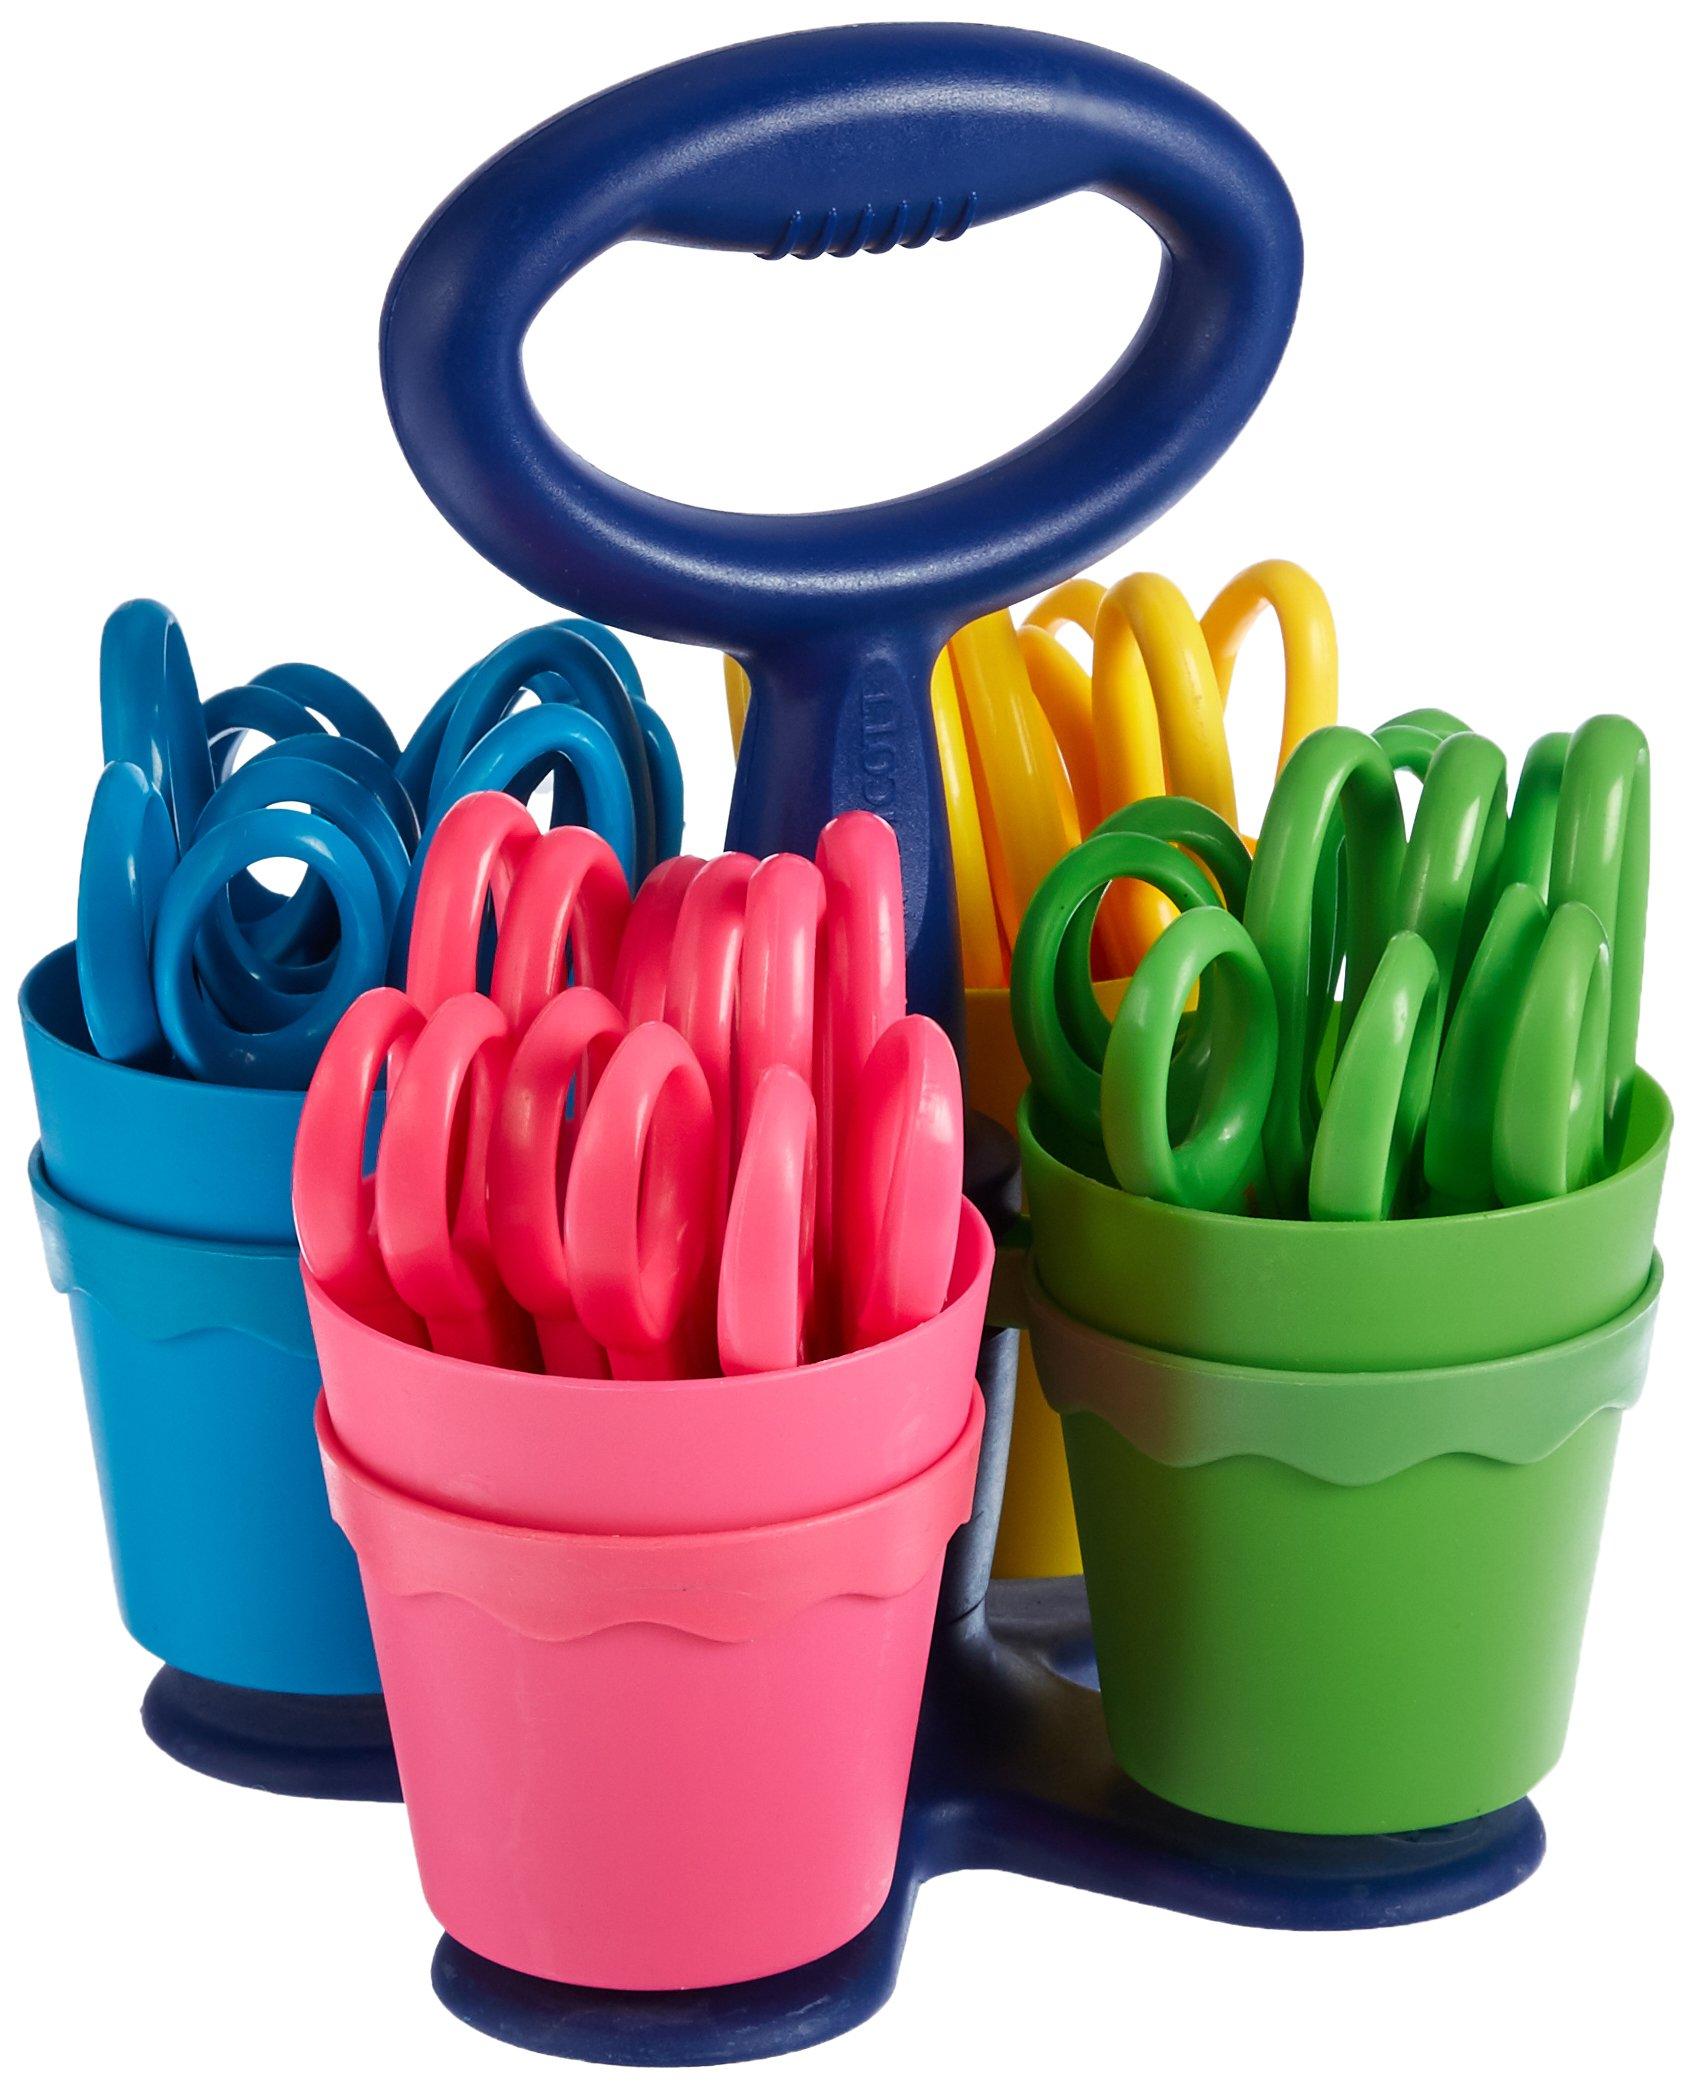 Scissor Caddy with 24 pieces 5'' Kids Blunt Scissors with Anti-Microbial (#14606) by Westcott